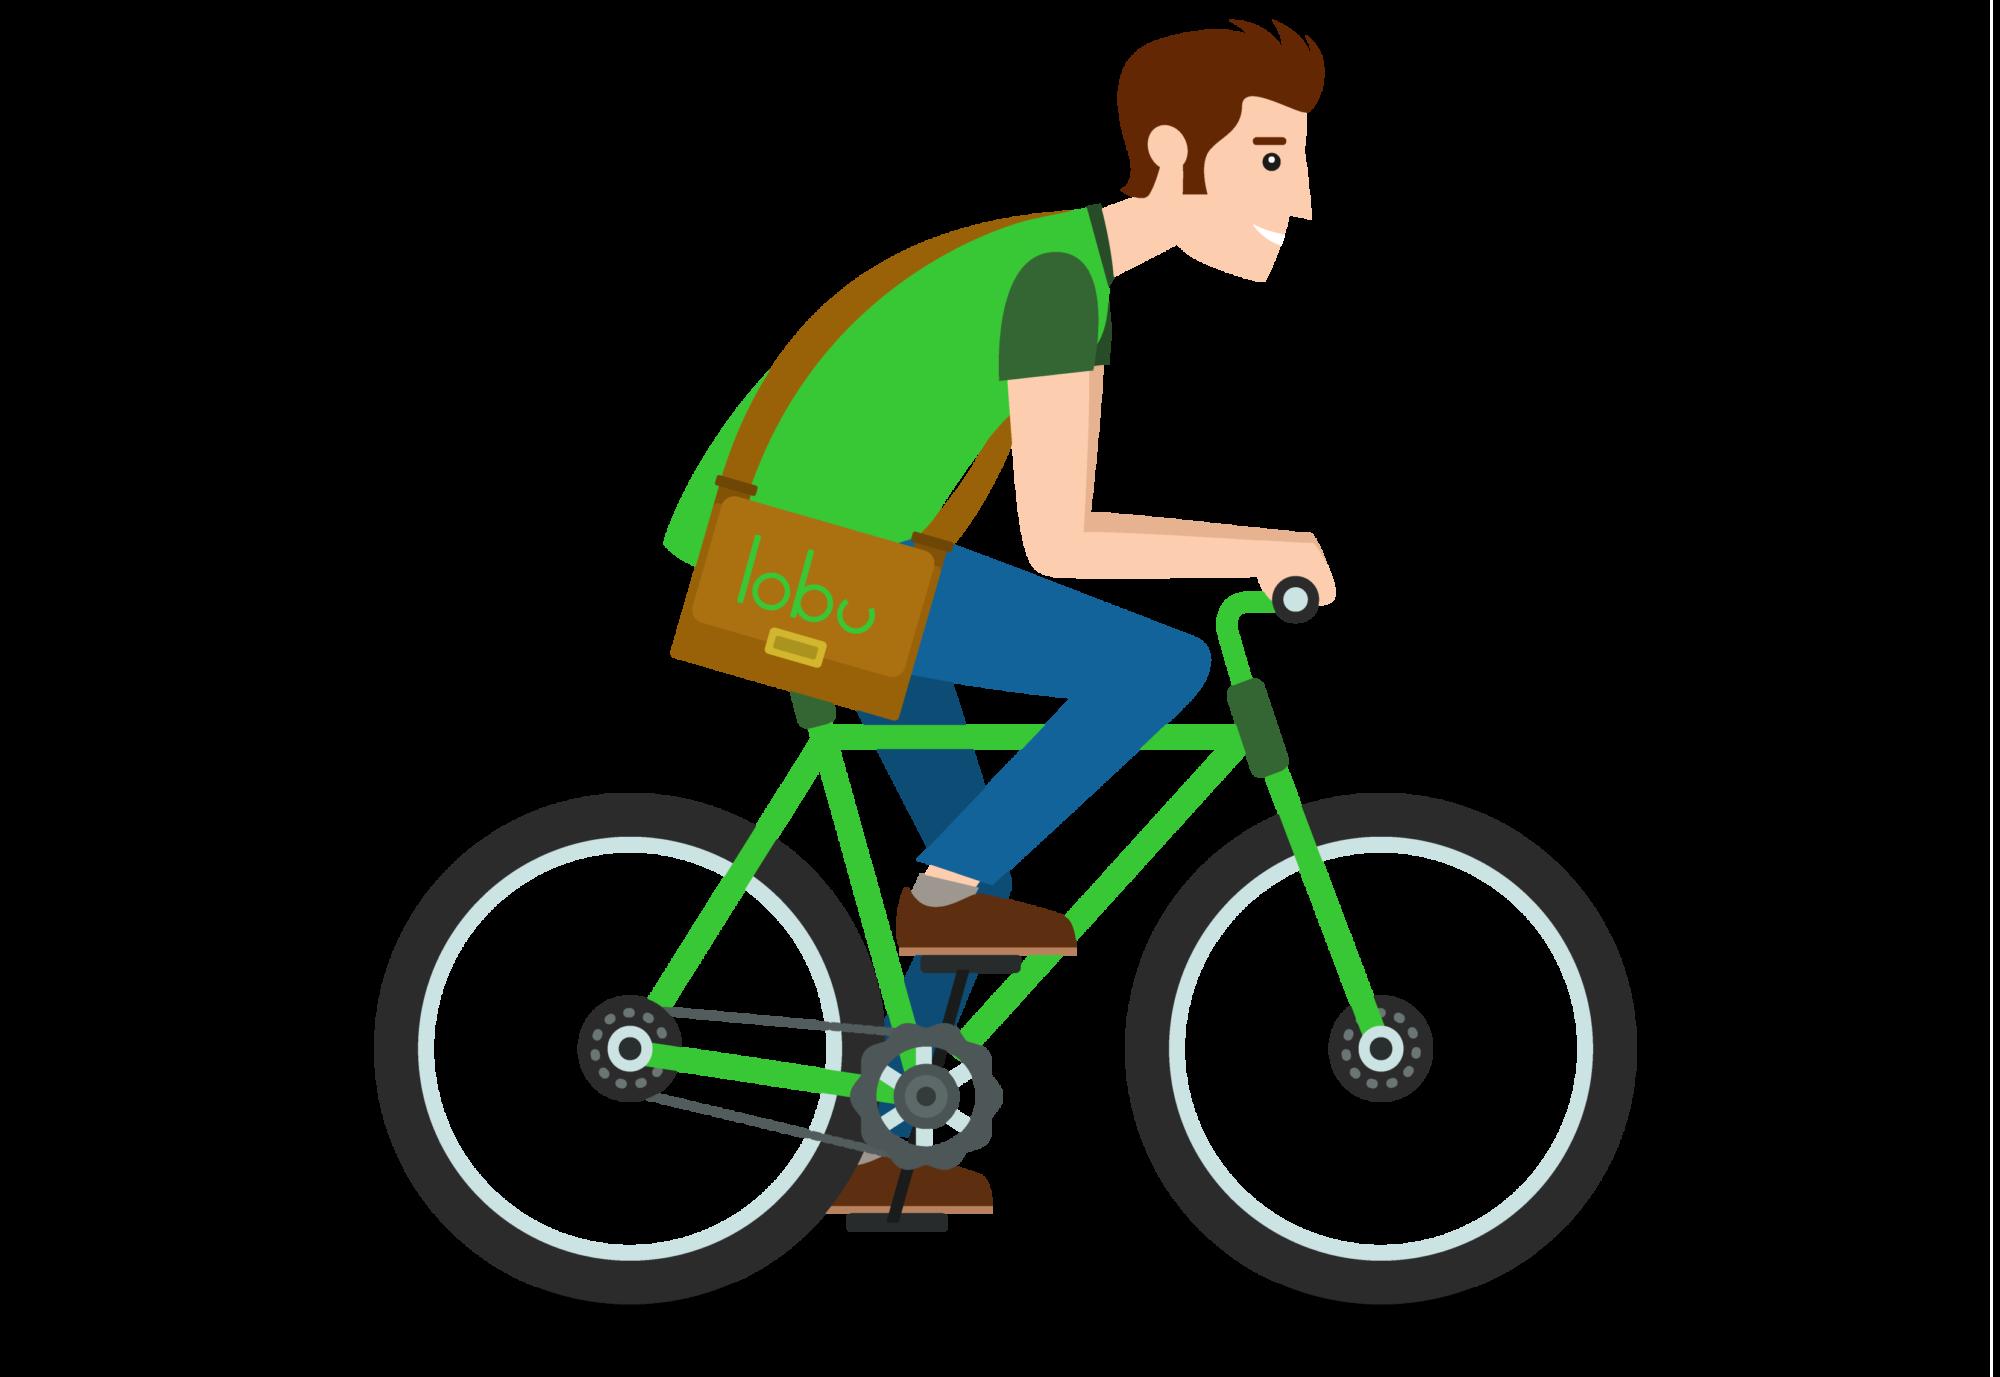 Lobu beschäftigt Fahrradboten, um Bücher auszuliefern